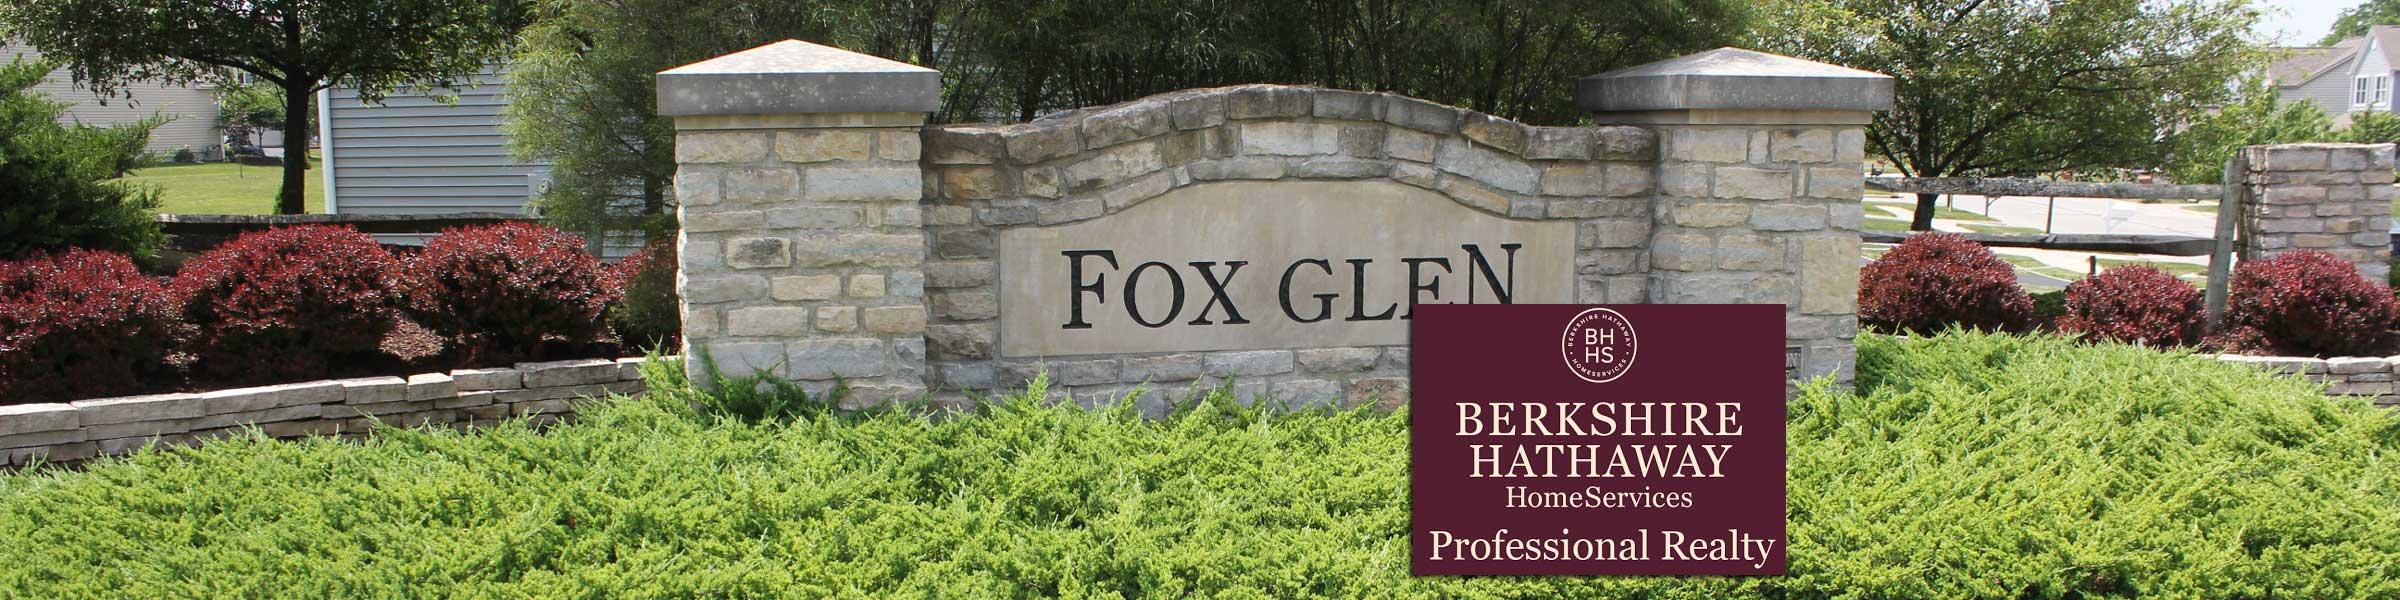 Fox Glen Pickerington Ohio Real Estate Amp Homes For Sale